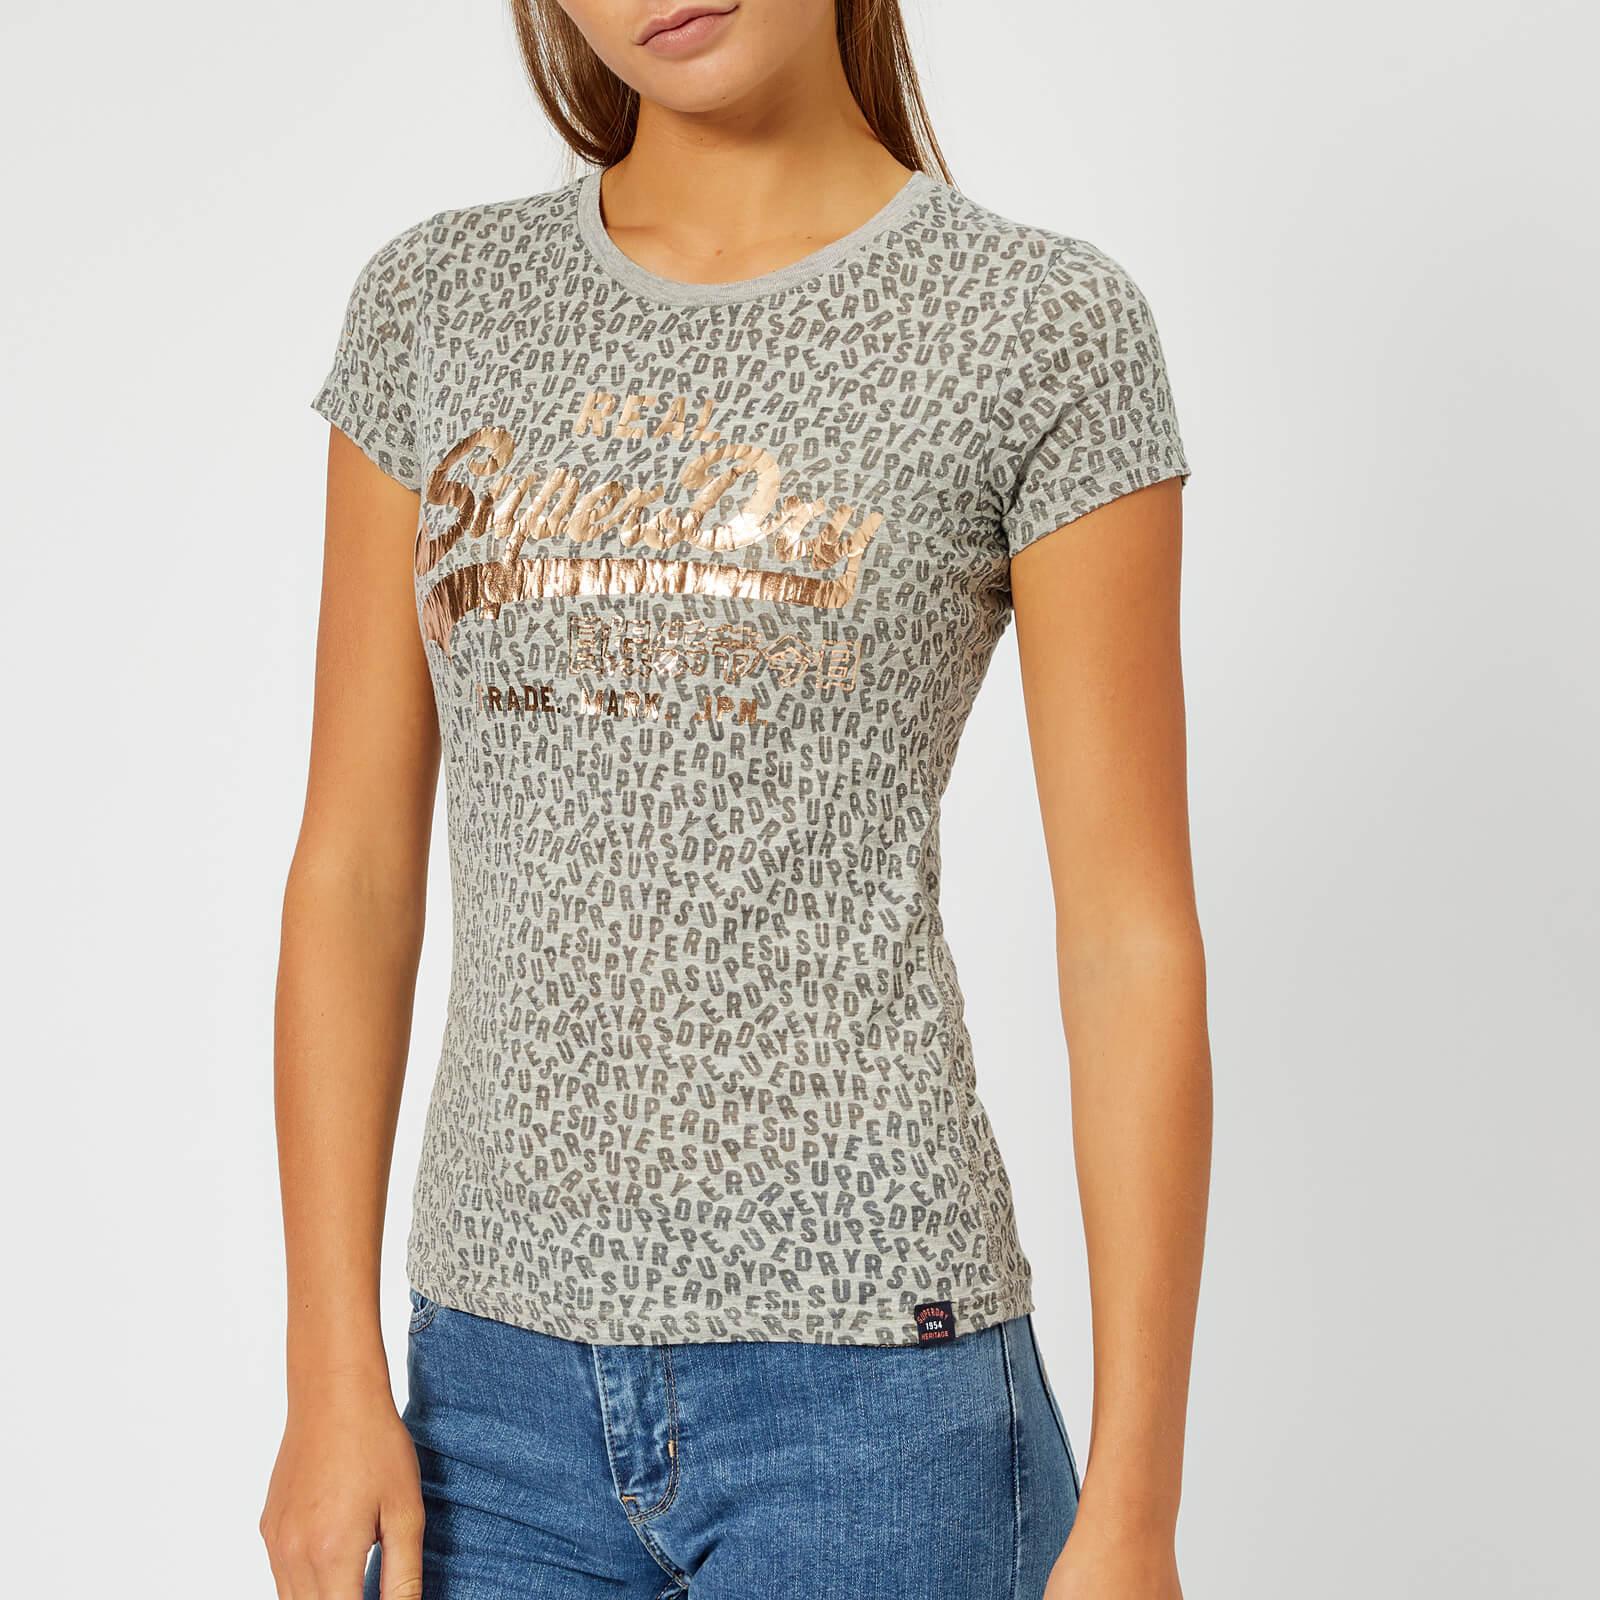 21ee3f45 Superdry Women's Vintage Logo Aop Burn Out Entry T-Shirt - Grey Marl Womens  Clothing | TheHut.com